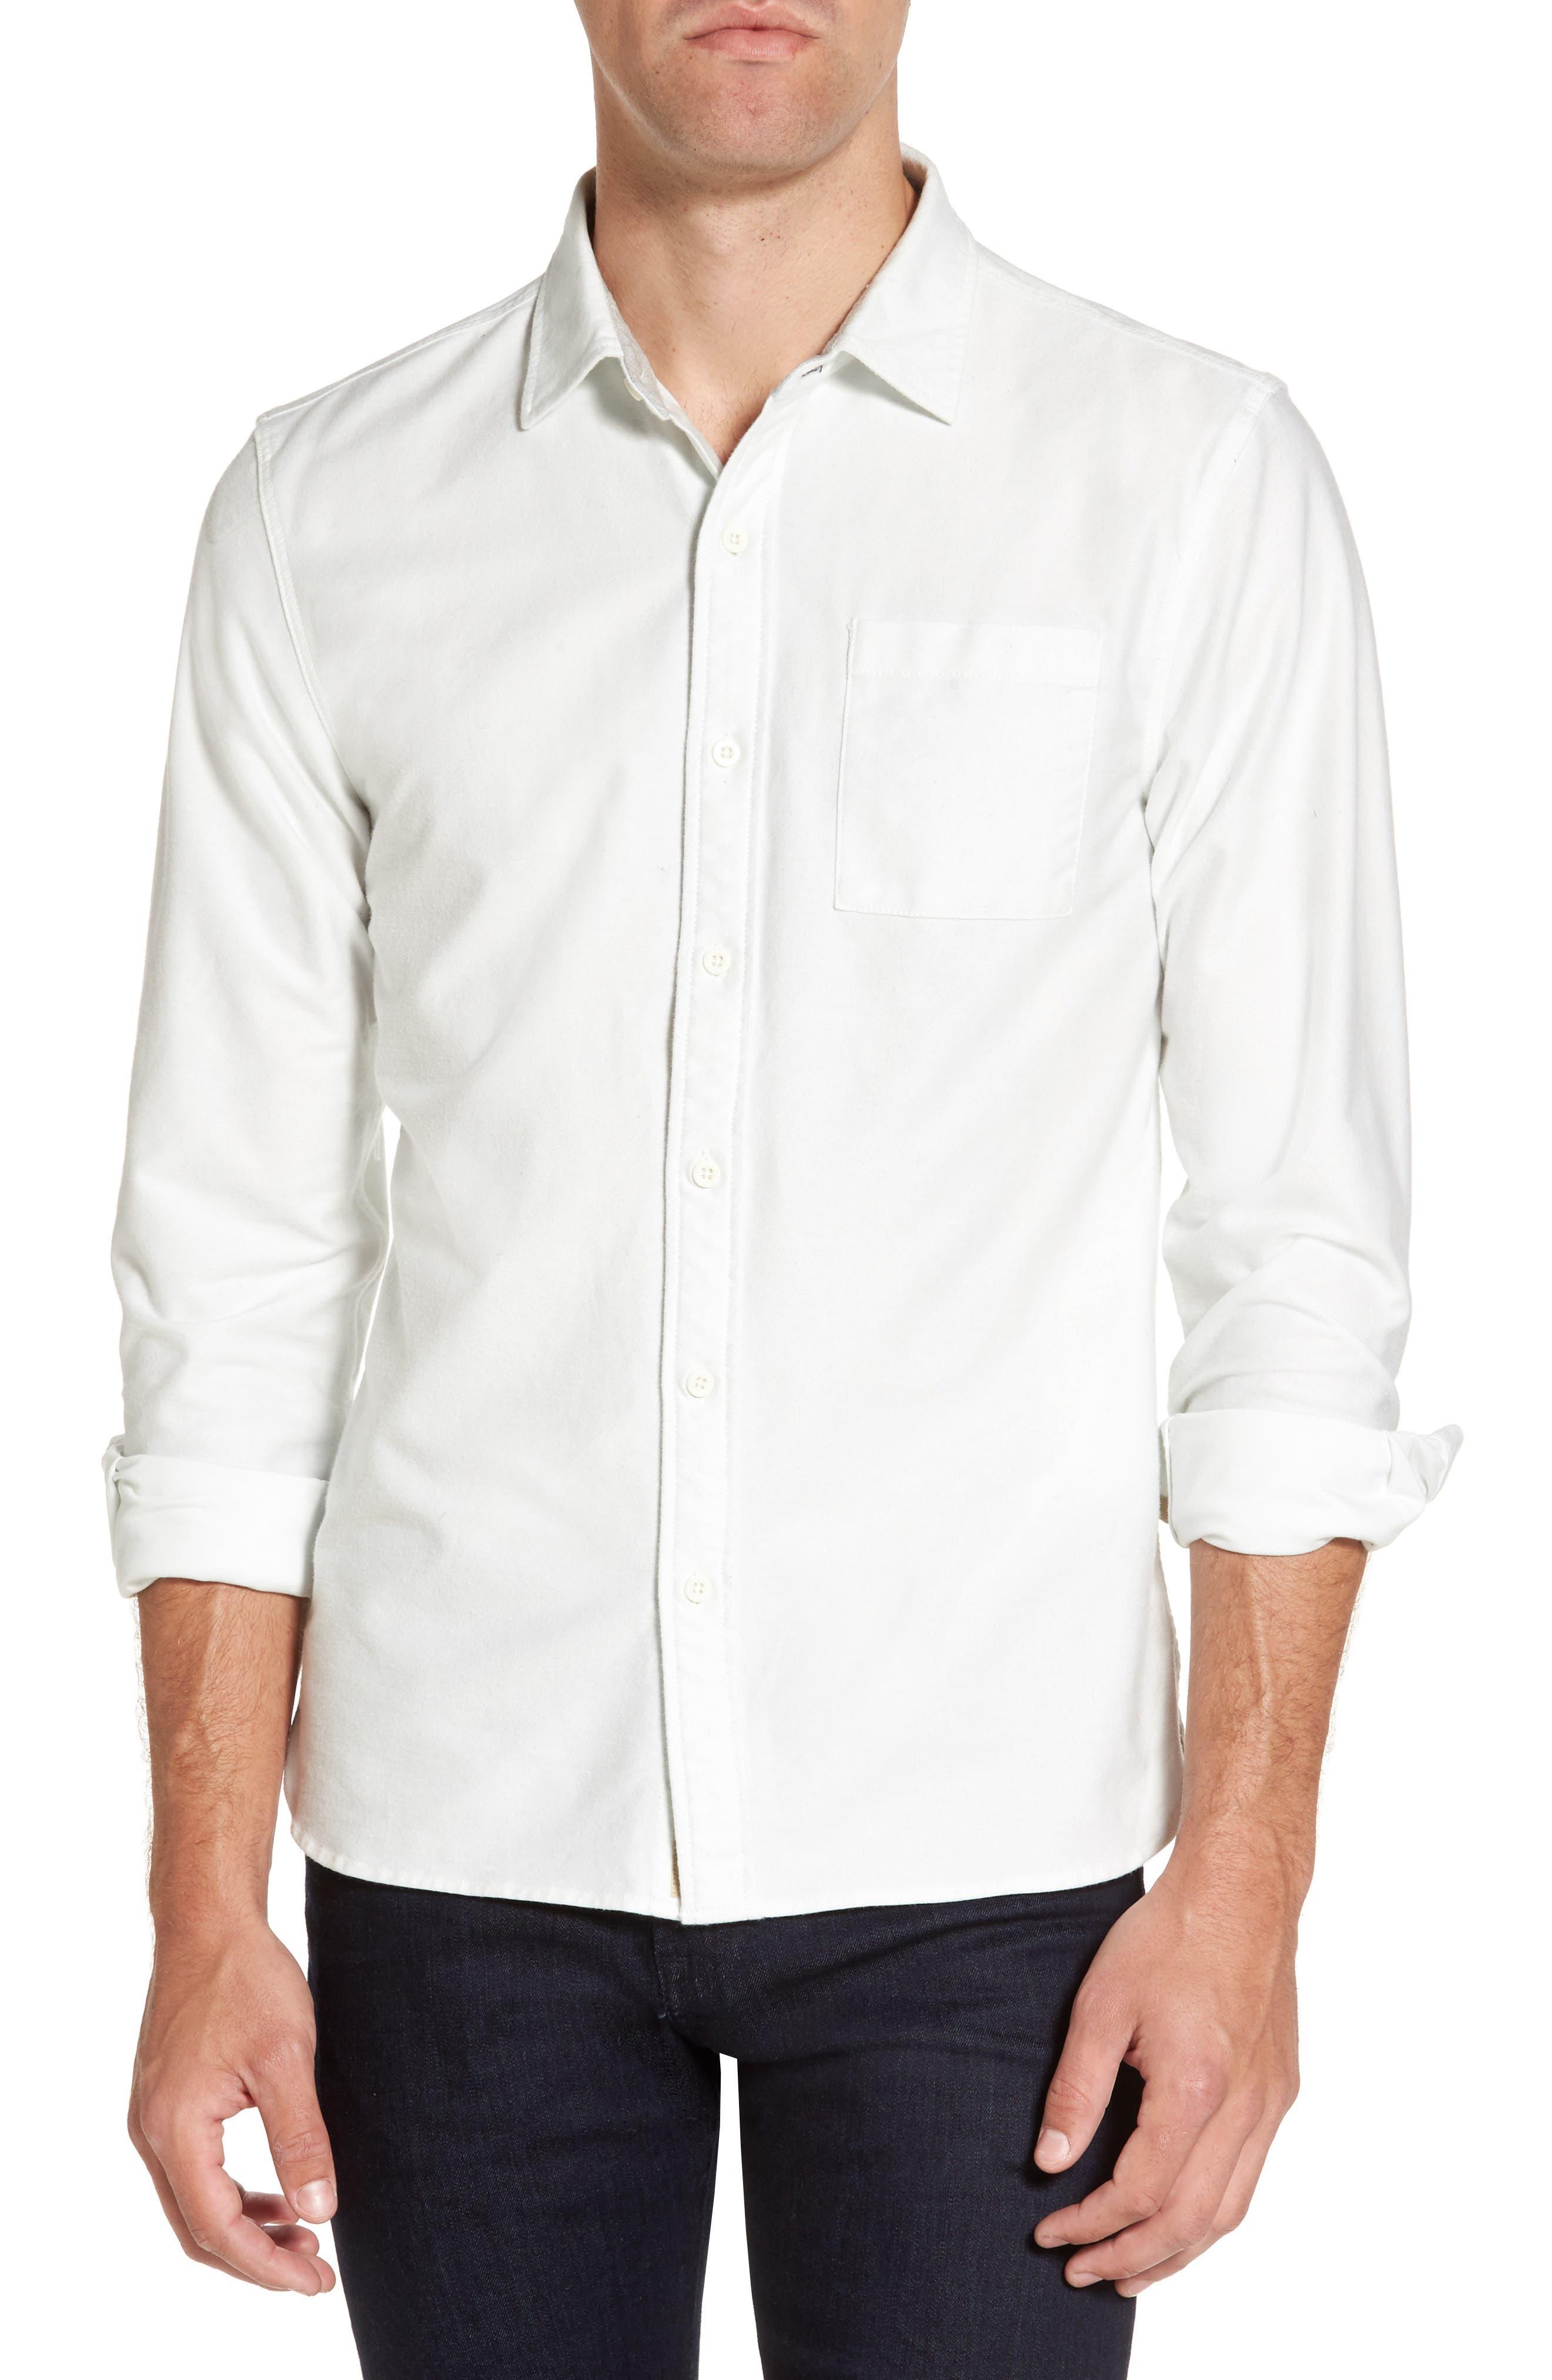 Main Image - Nifty Genius Truman Solid Sport Shirt